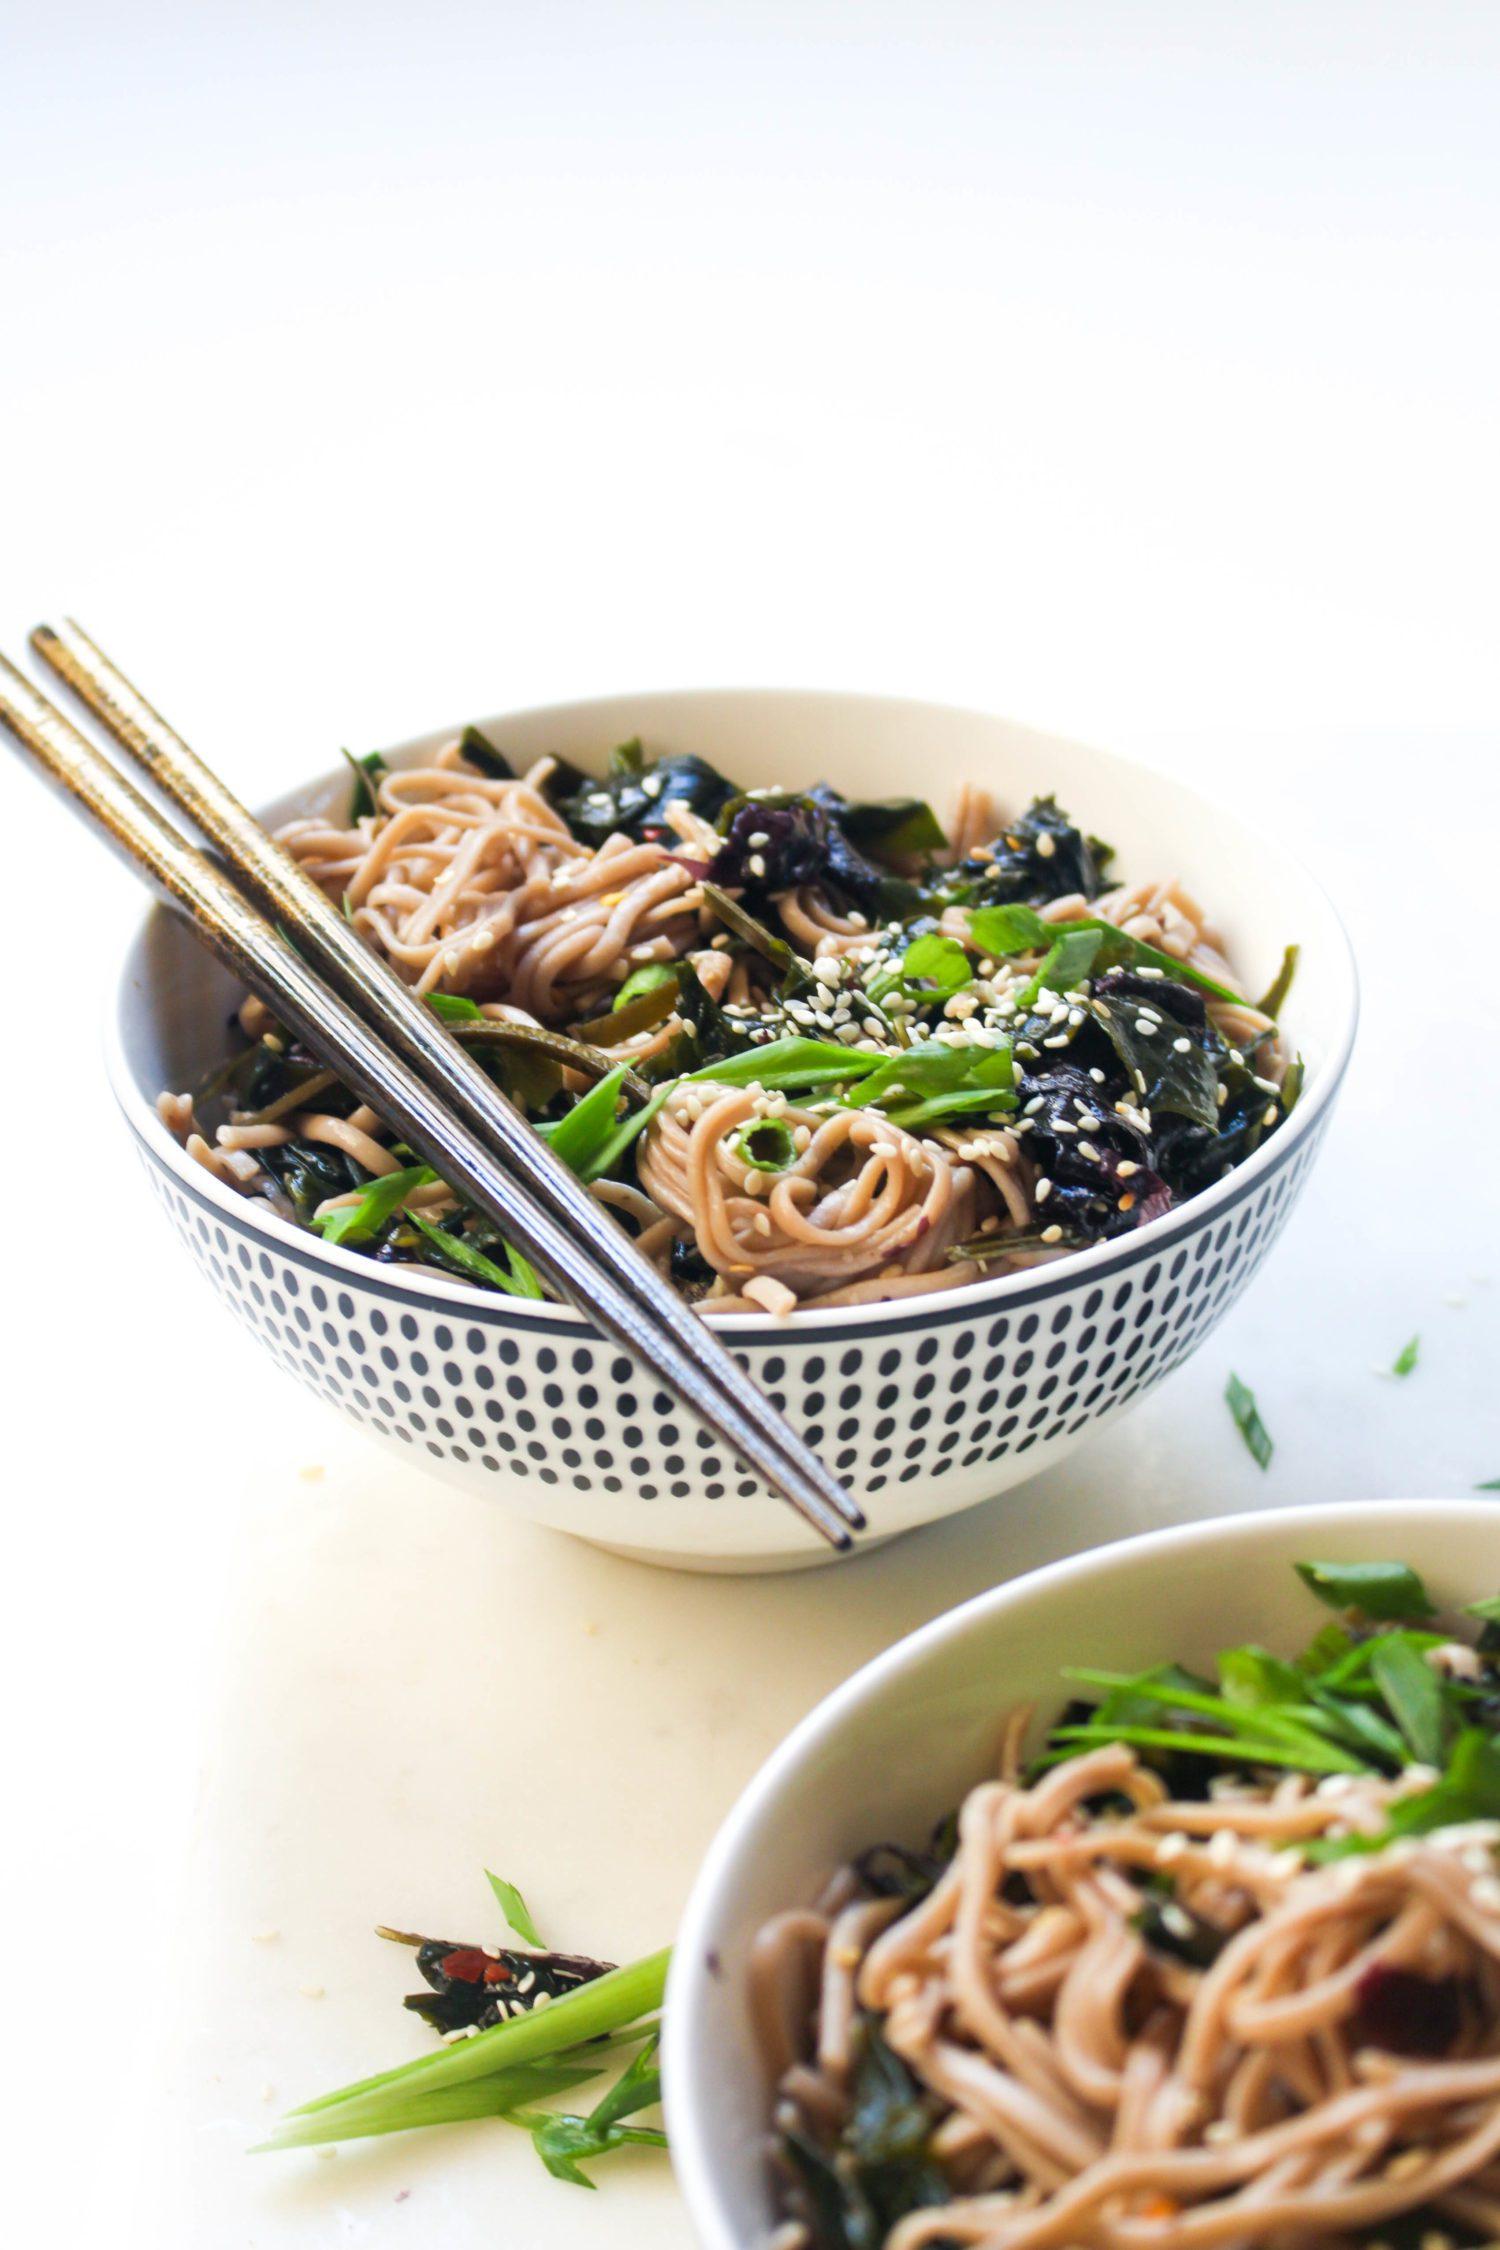 Seaweed soba noodles